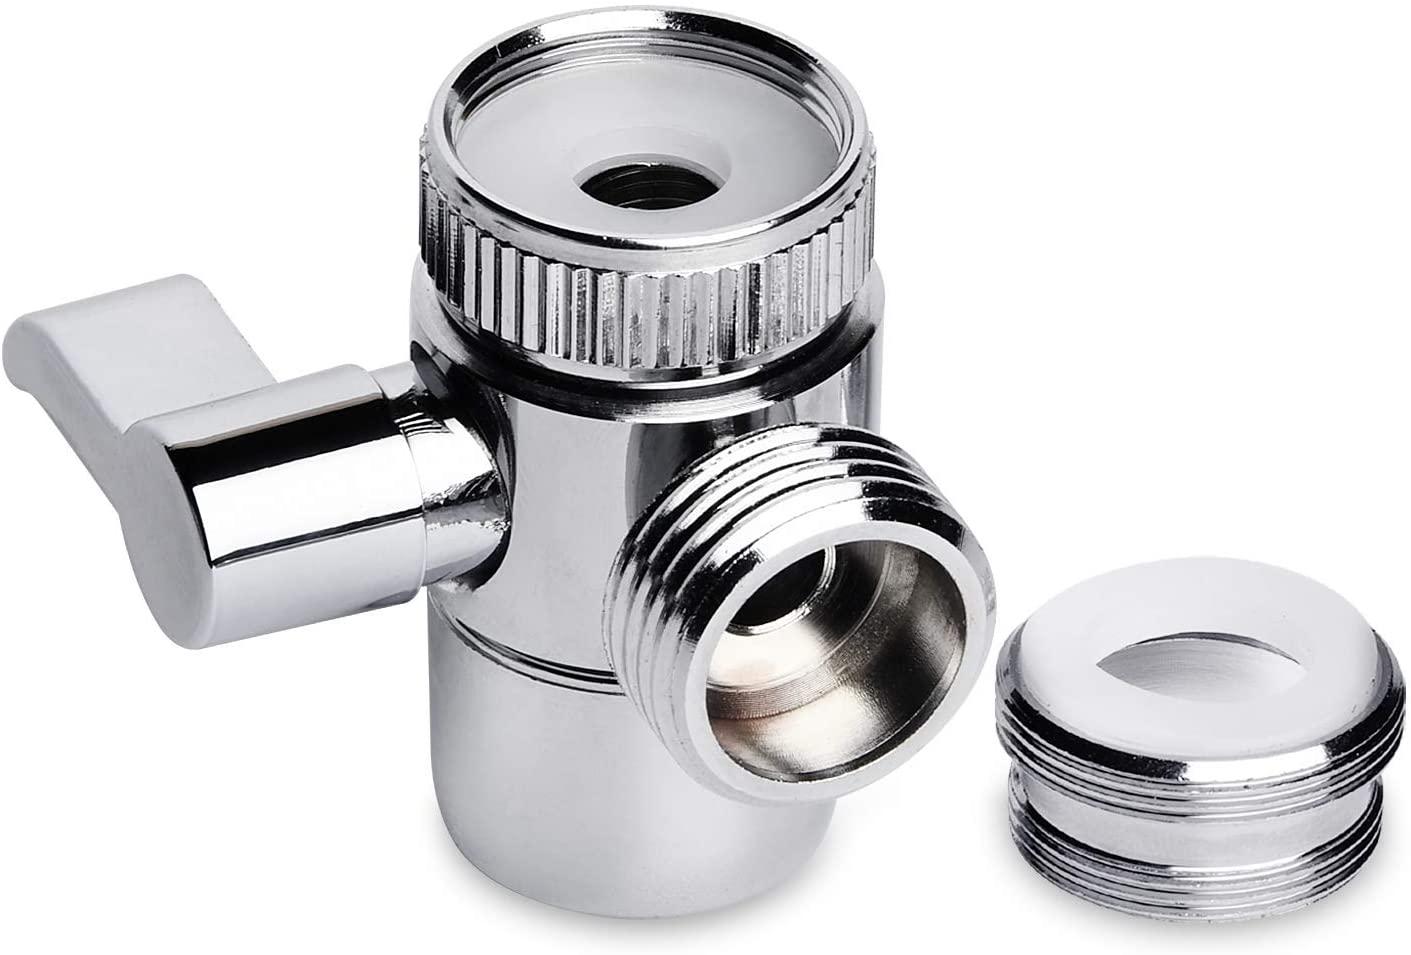 Supkiir Shower Diverter Valve, Sink Valve Diverter Faucet Splitter Hose Adapter for Kitchen Bathroom Sink Faucet Replacement Part